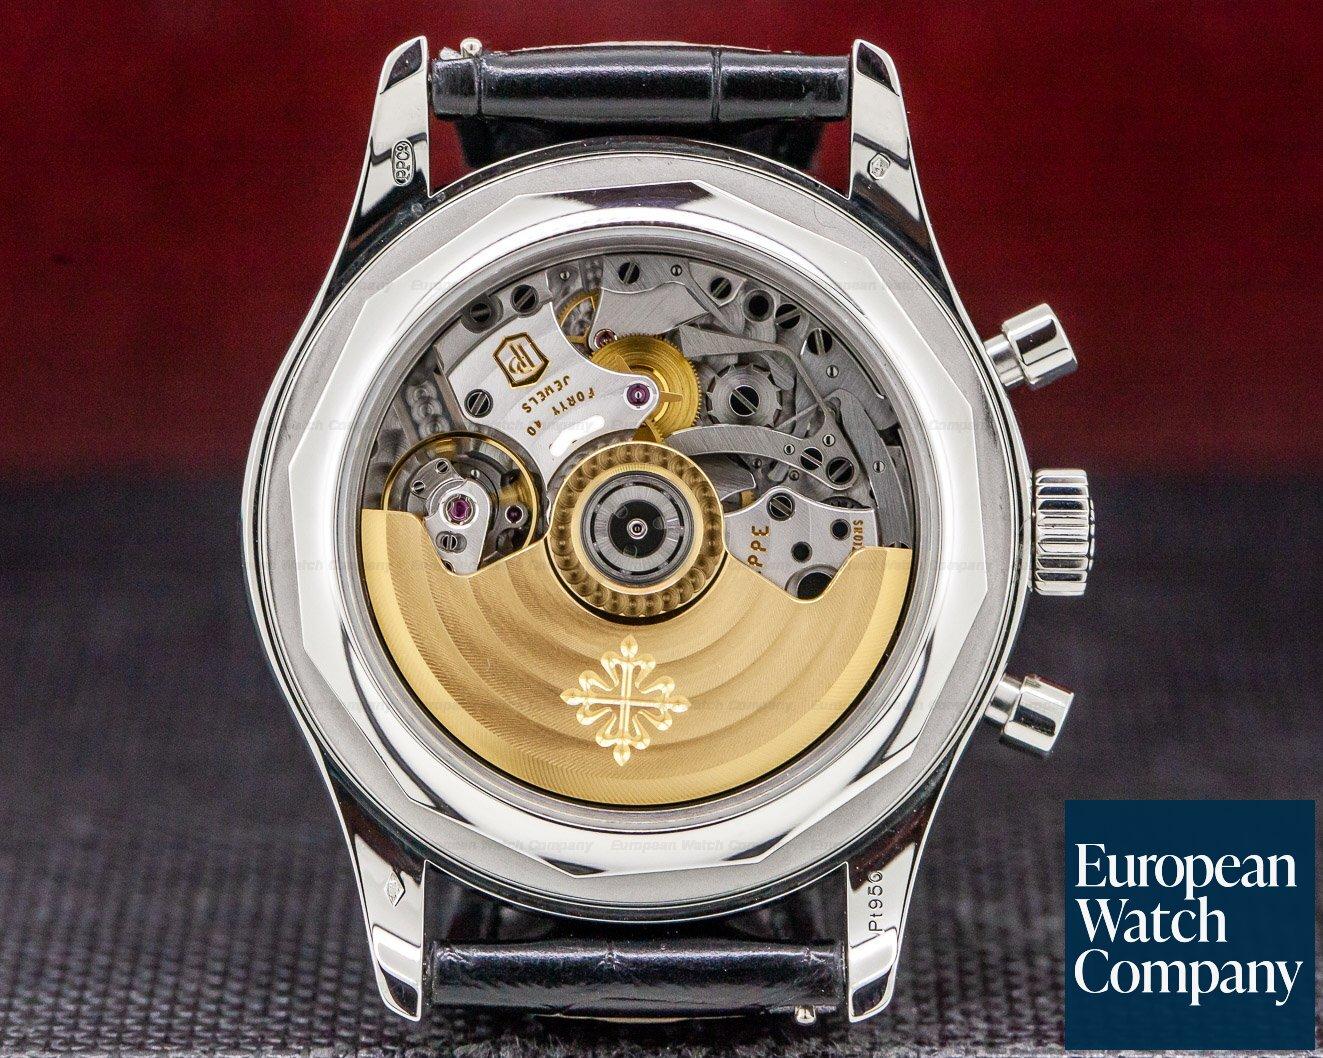 Patek Philippe 5960P-016 Annual Calendar Chronograph BLACK DIAL